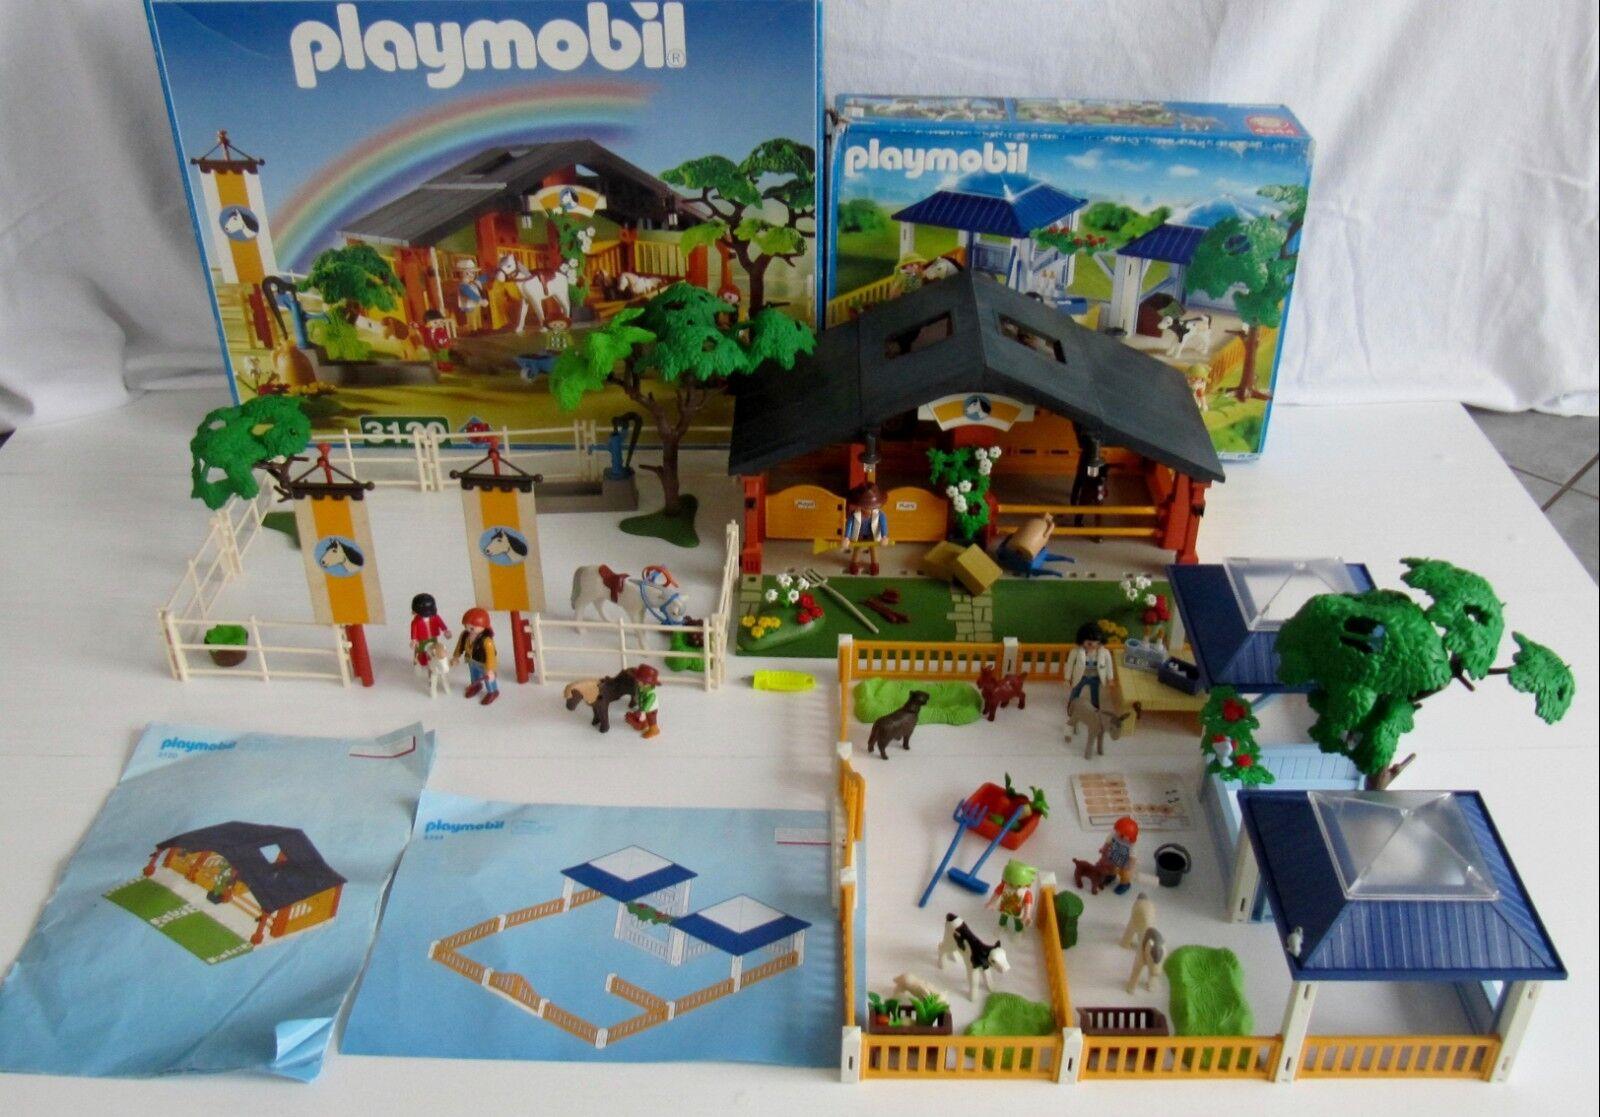 Fantastico Set  PLAYMOBIL  reiterhof 3120 + cura degli animali Station 4344    con Ba e OVP  punto vendita